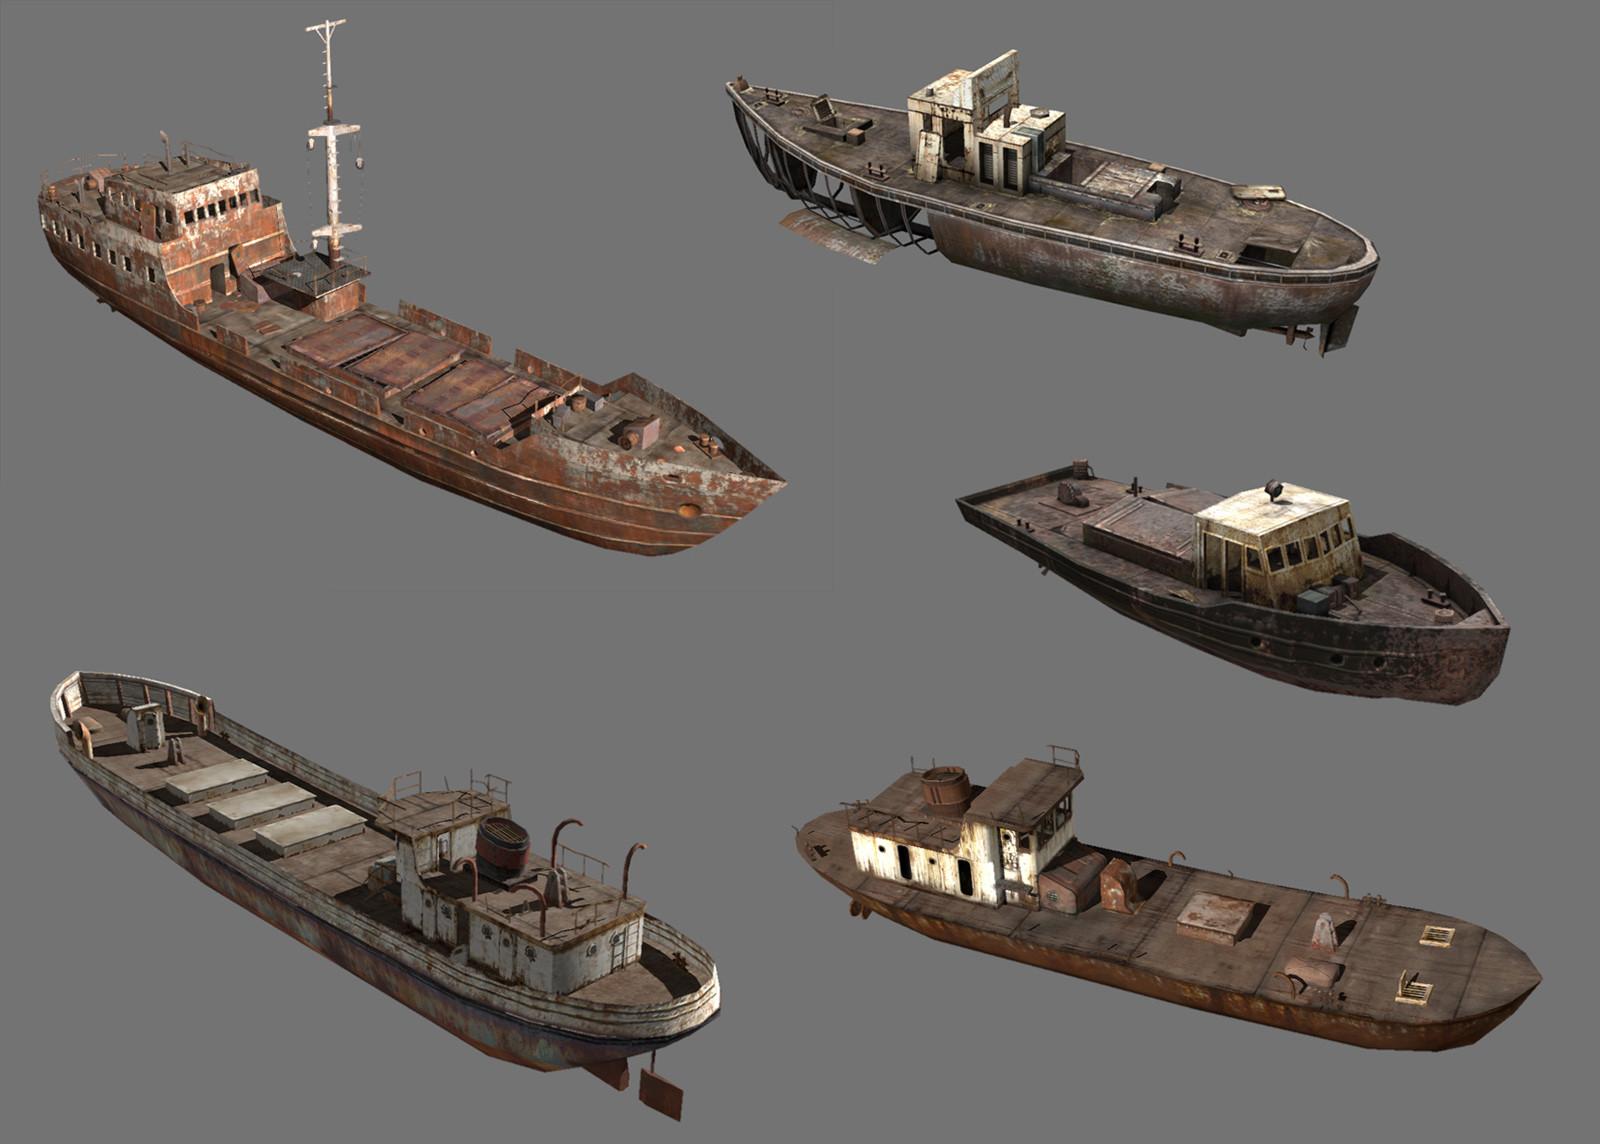 David sanhueza davidsanhueza eon vehicle shipwrecks